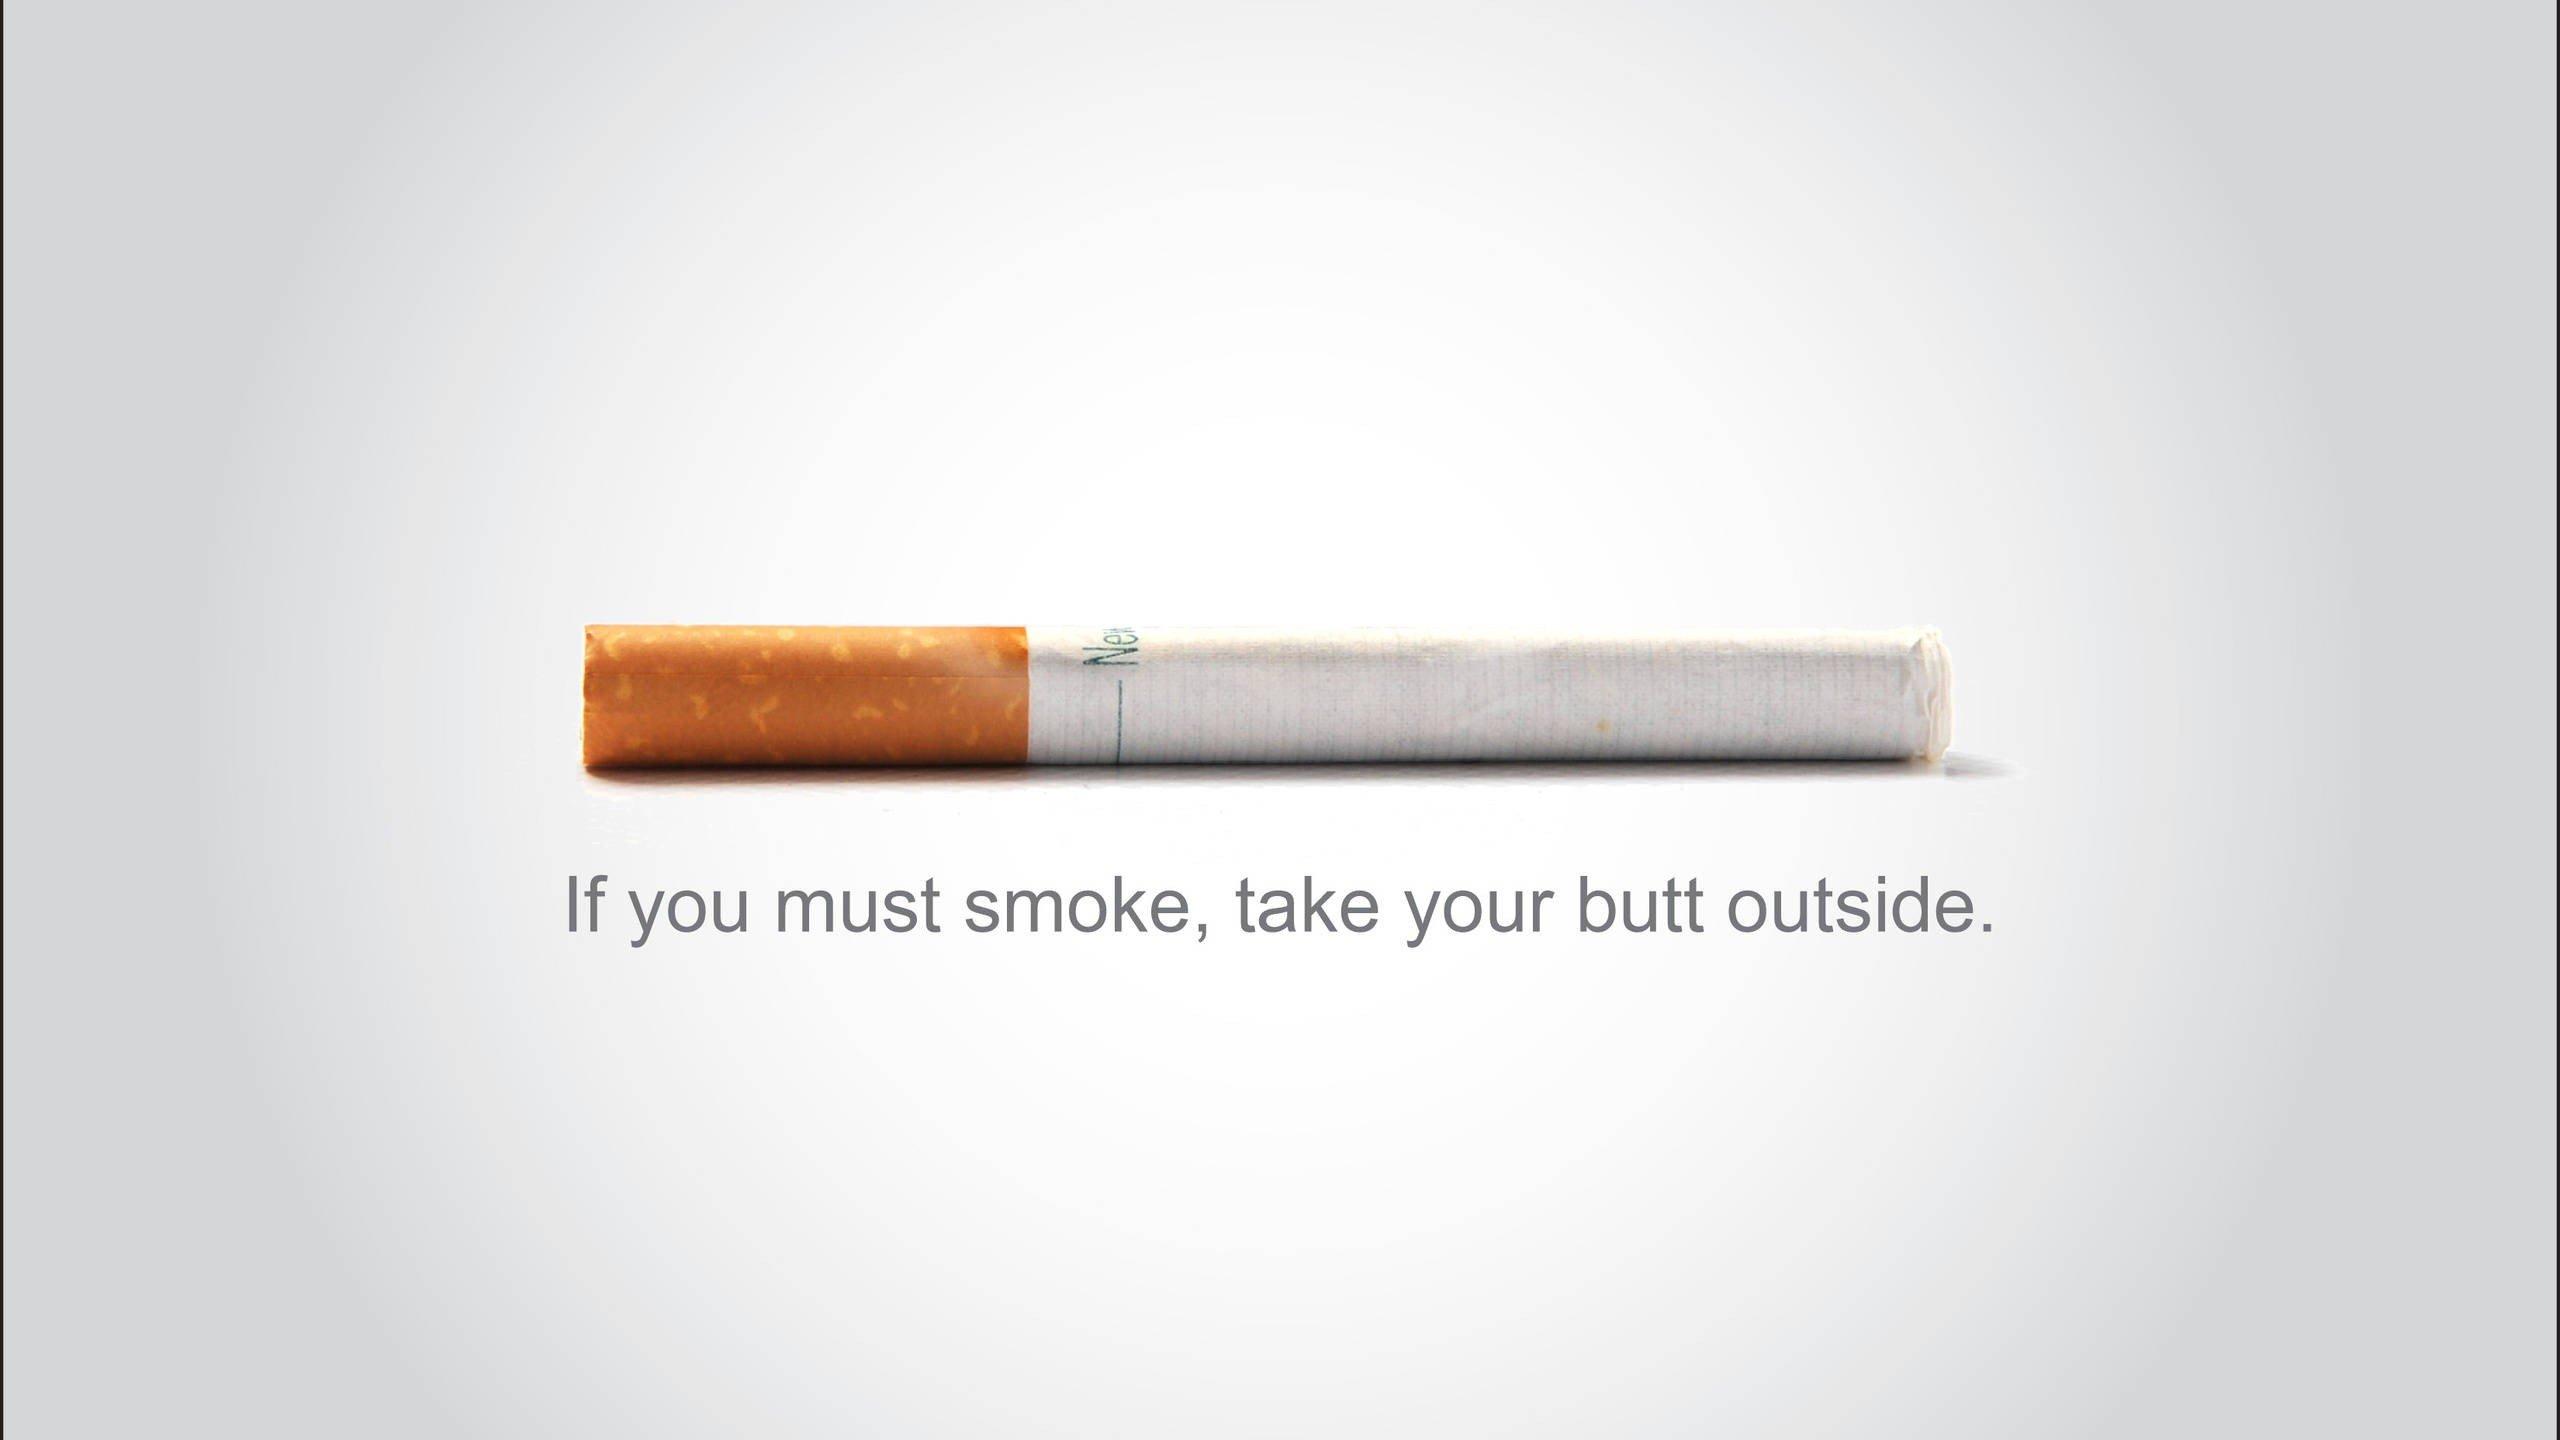 cigarettes, Public Service Announcement, Smoking Wallpaper